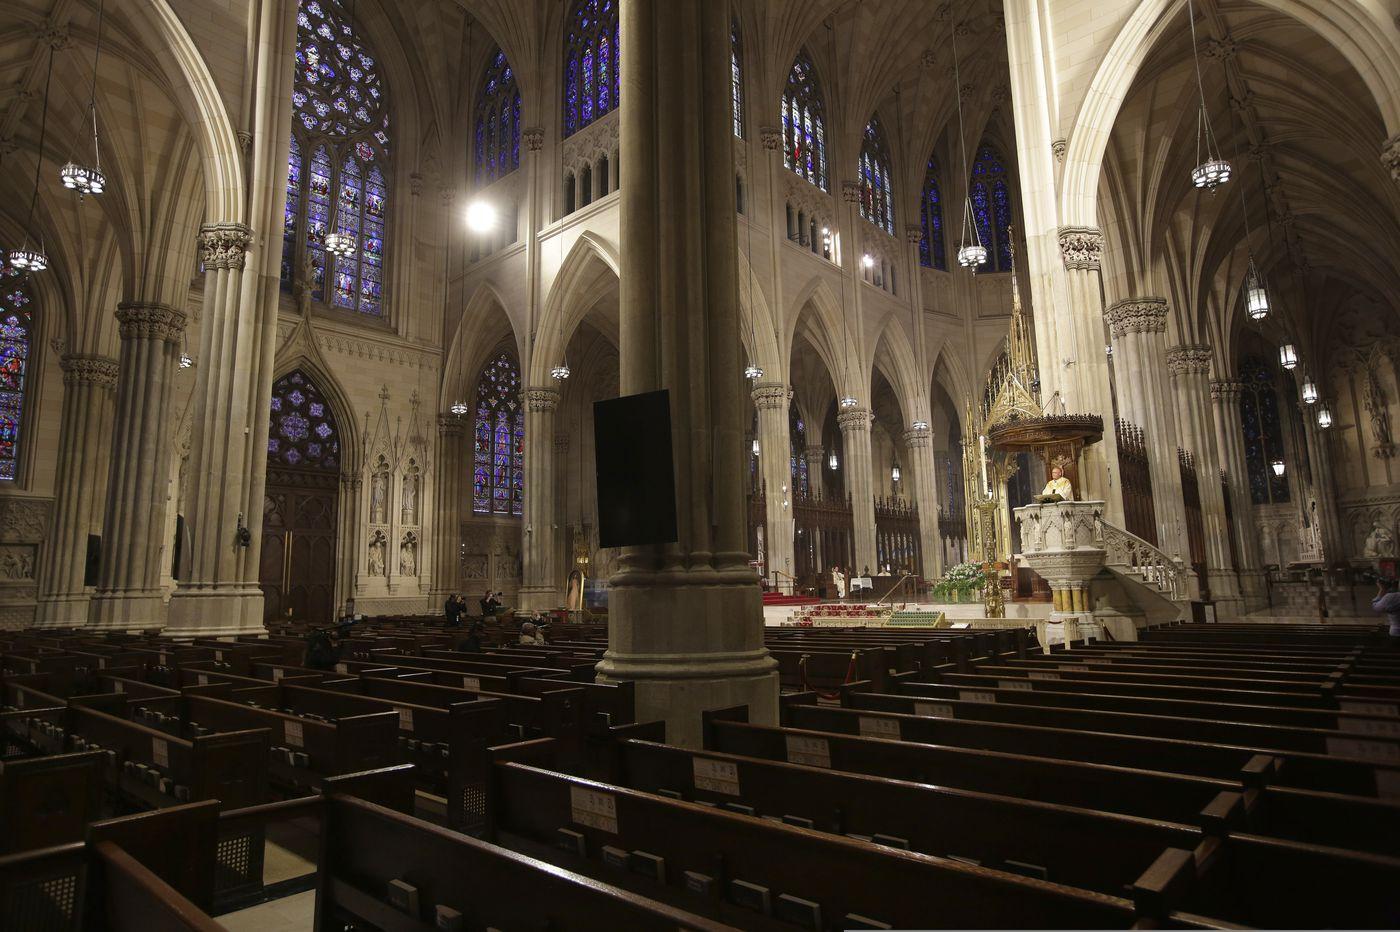 U.S. Roman Catholic Church won at least $1.4 billion in coronavirus aid after lobbying